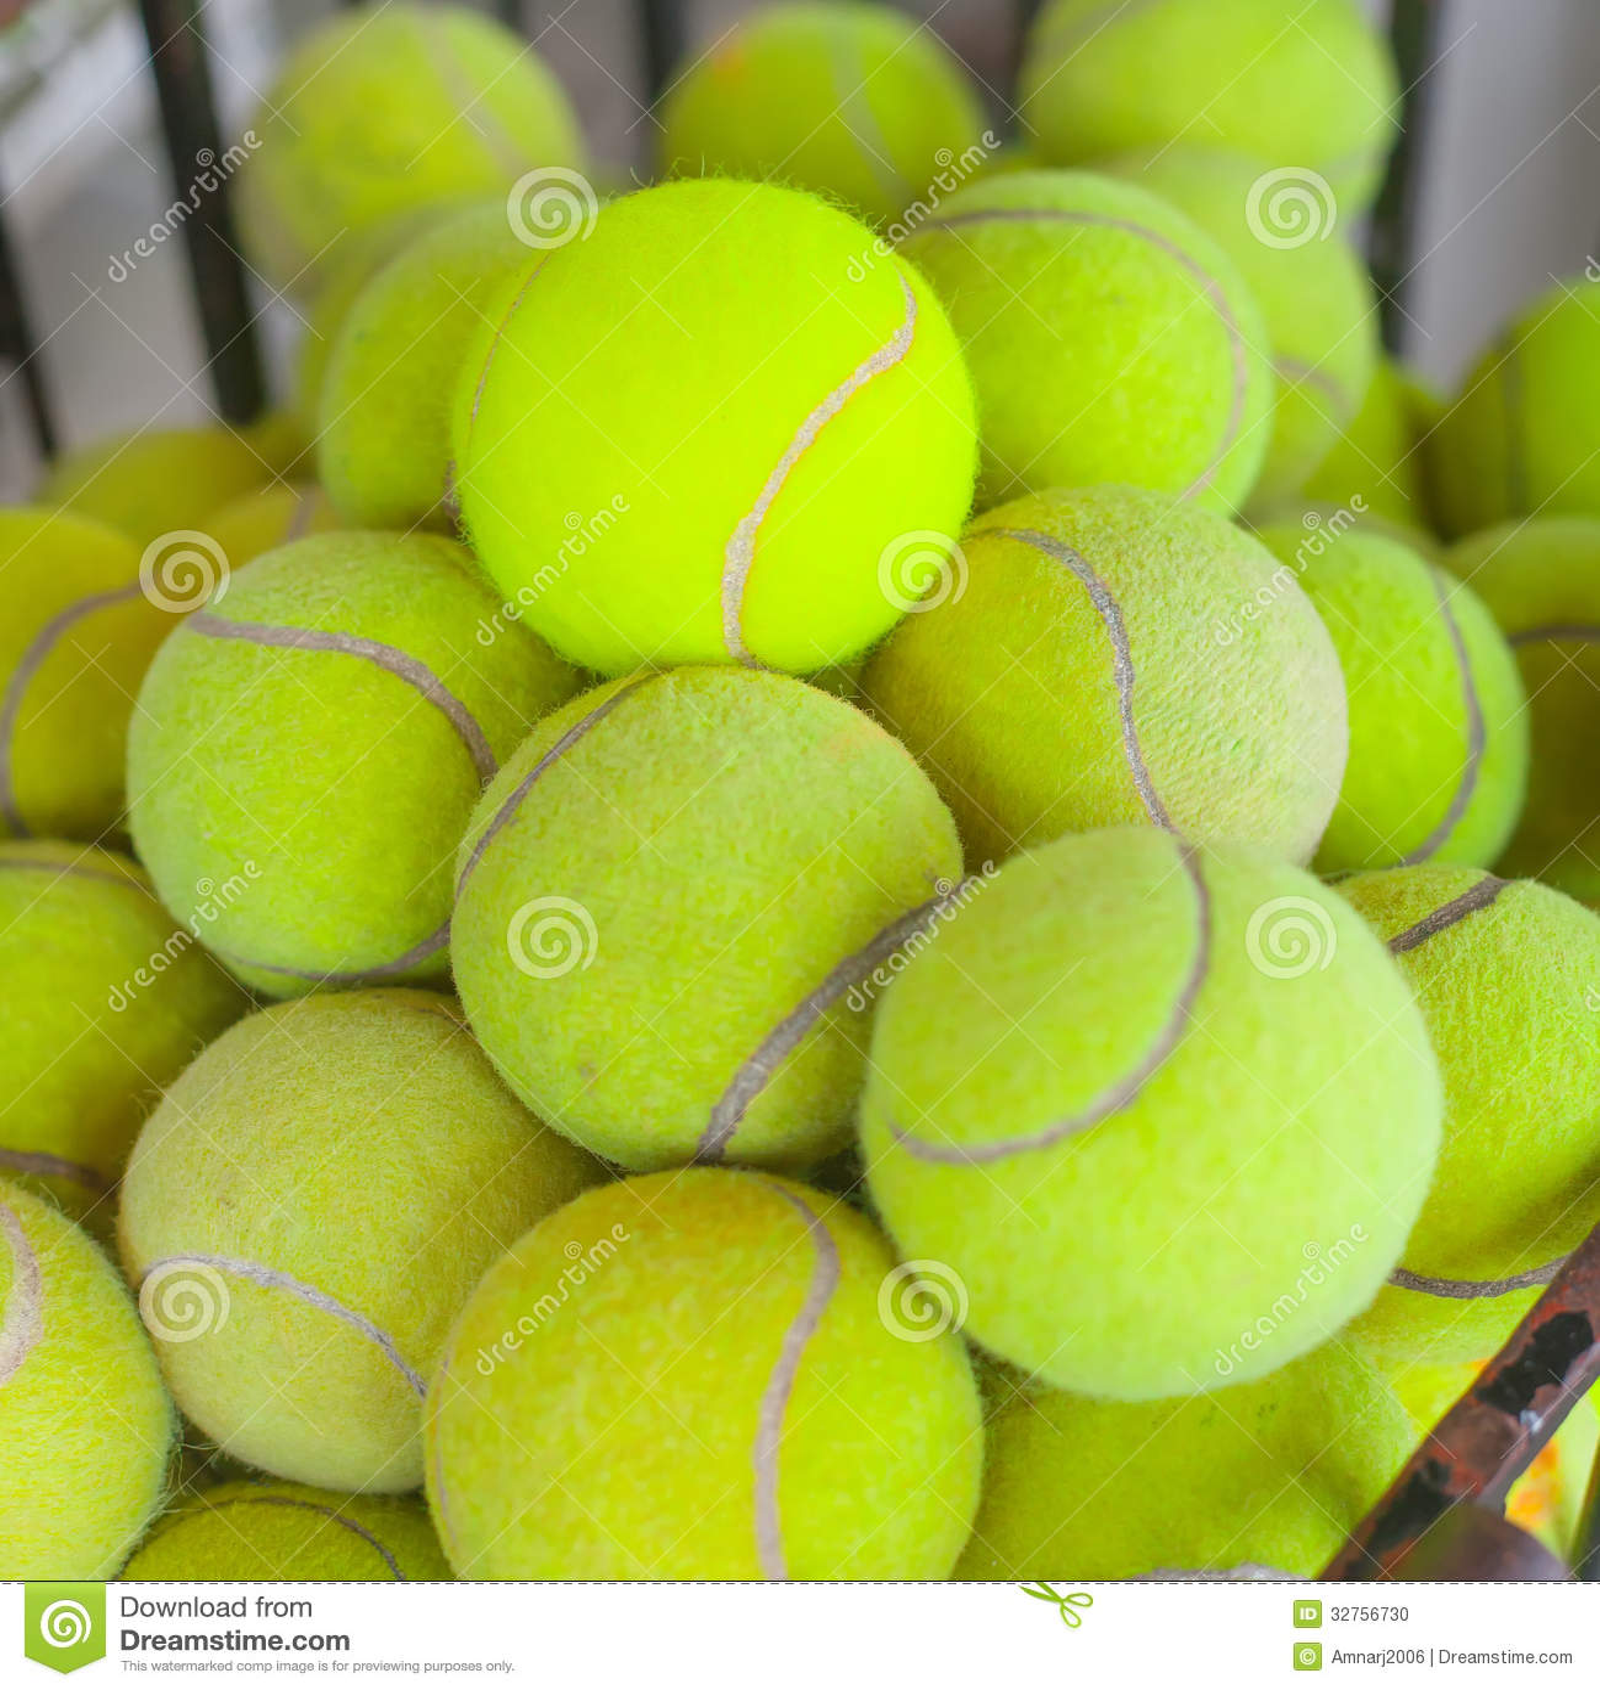 Tennis Balls Stock Photo - Image: 32756730